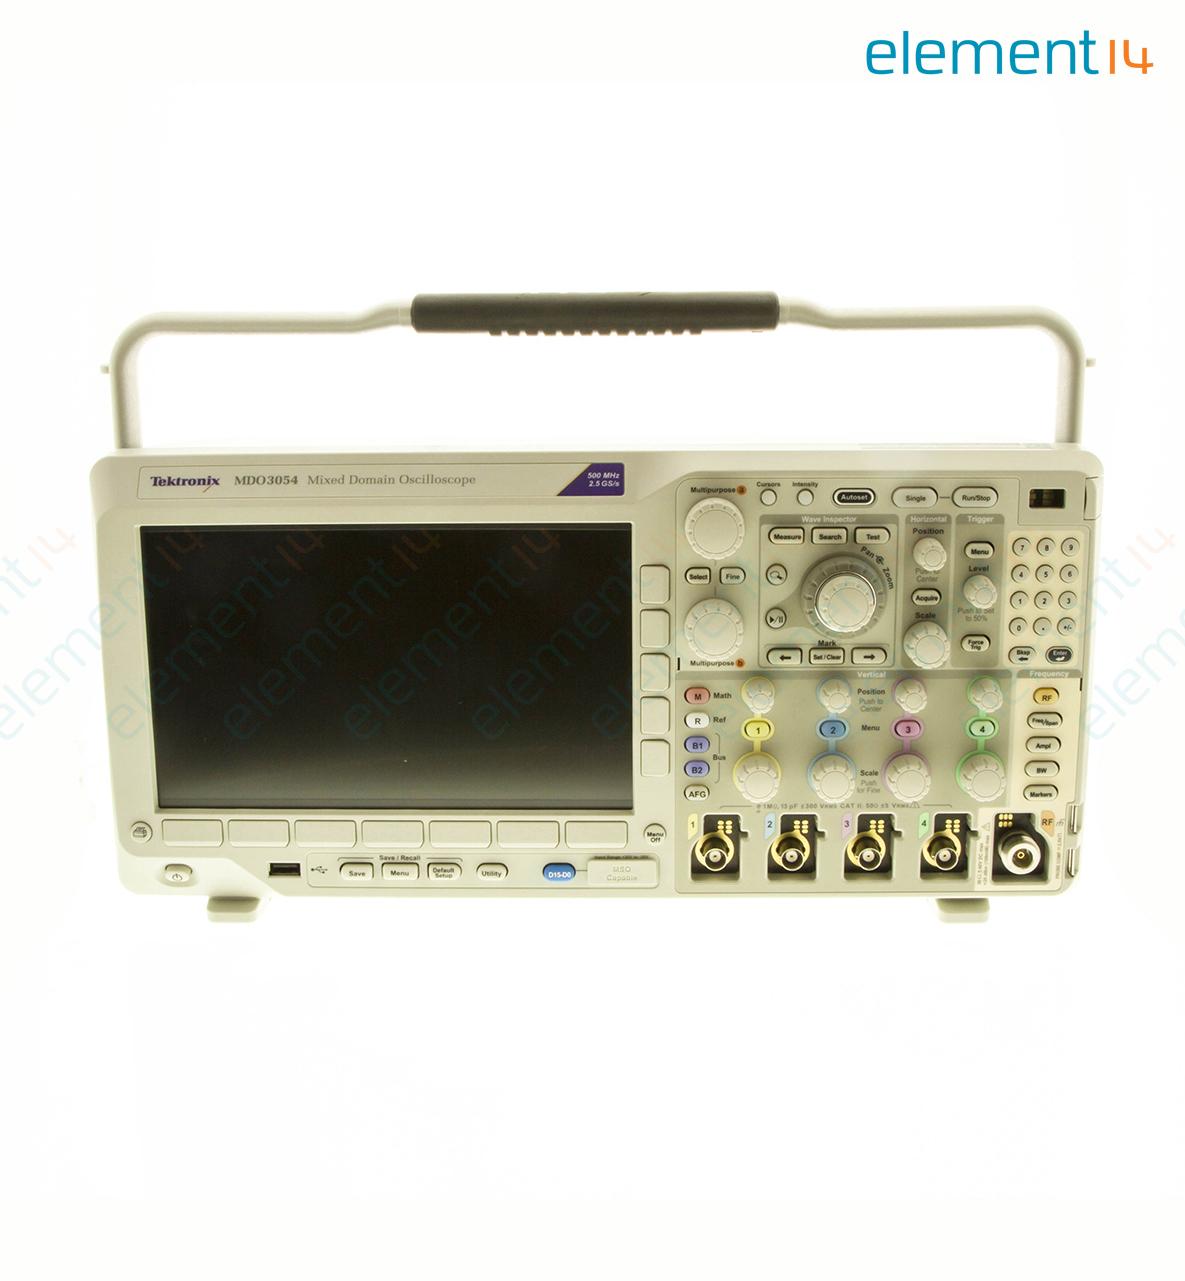 Mdo3054 Tektronix Oscilloscope Mdo3000 Series 4 Channel 0 500mhz Pic16f876 Rf Power Meter Richmedia 352kb En